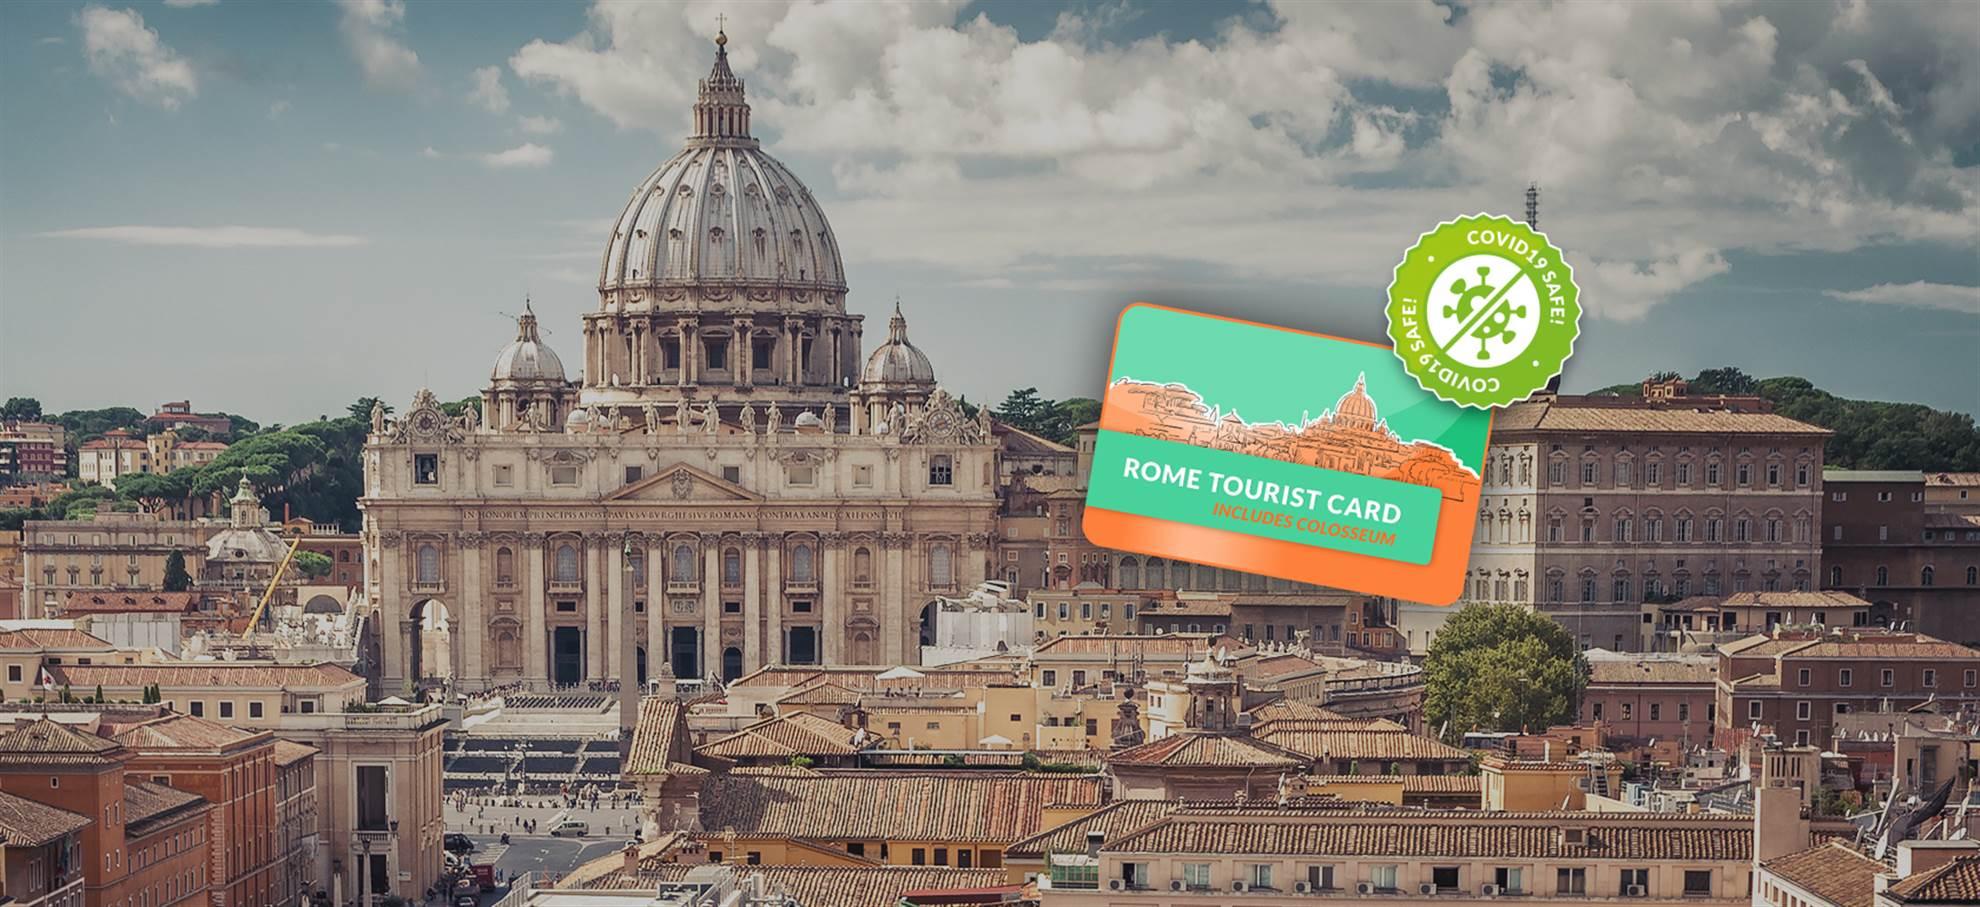 Roma Tourist Card